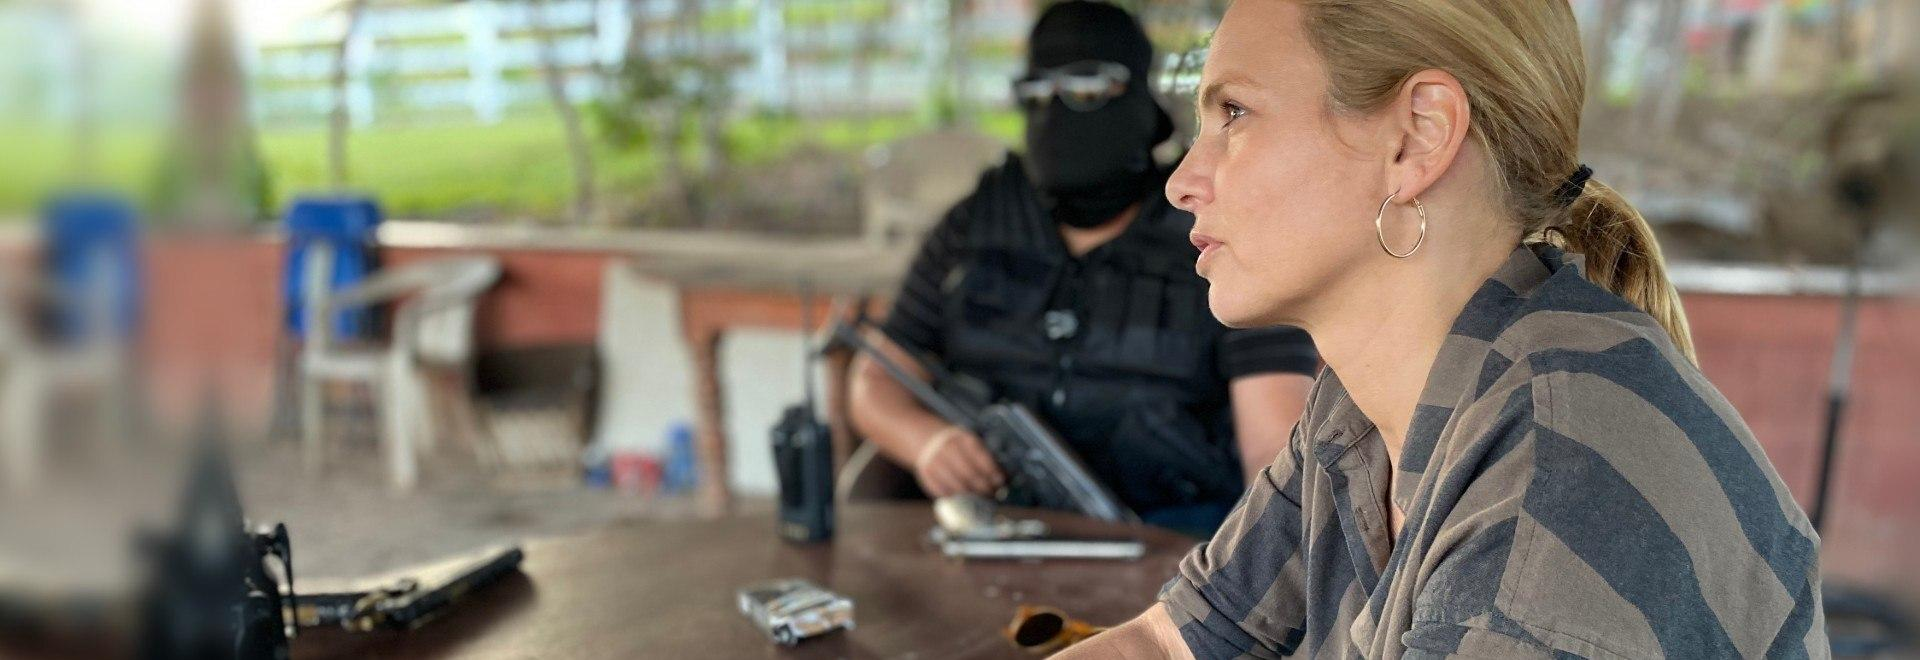 Cocaina: rotte illegali